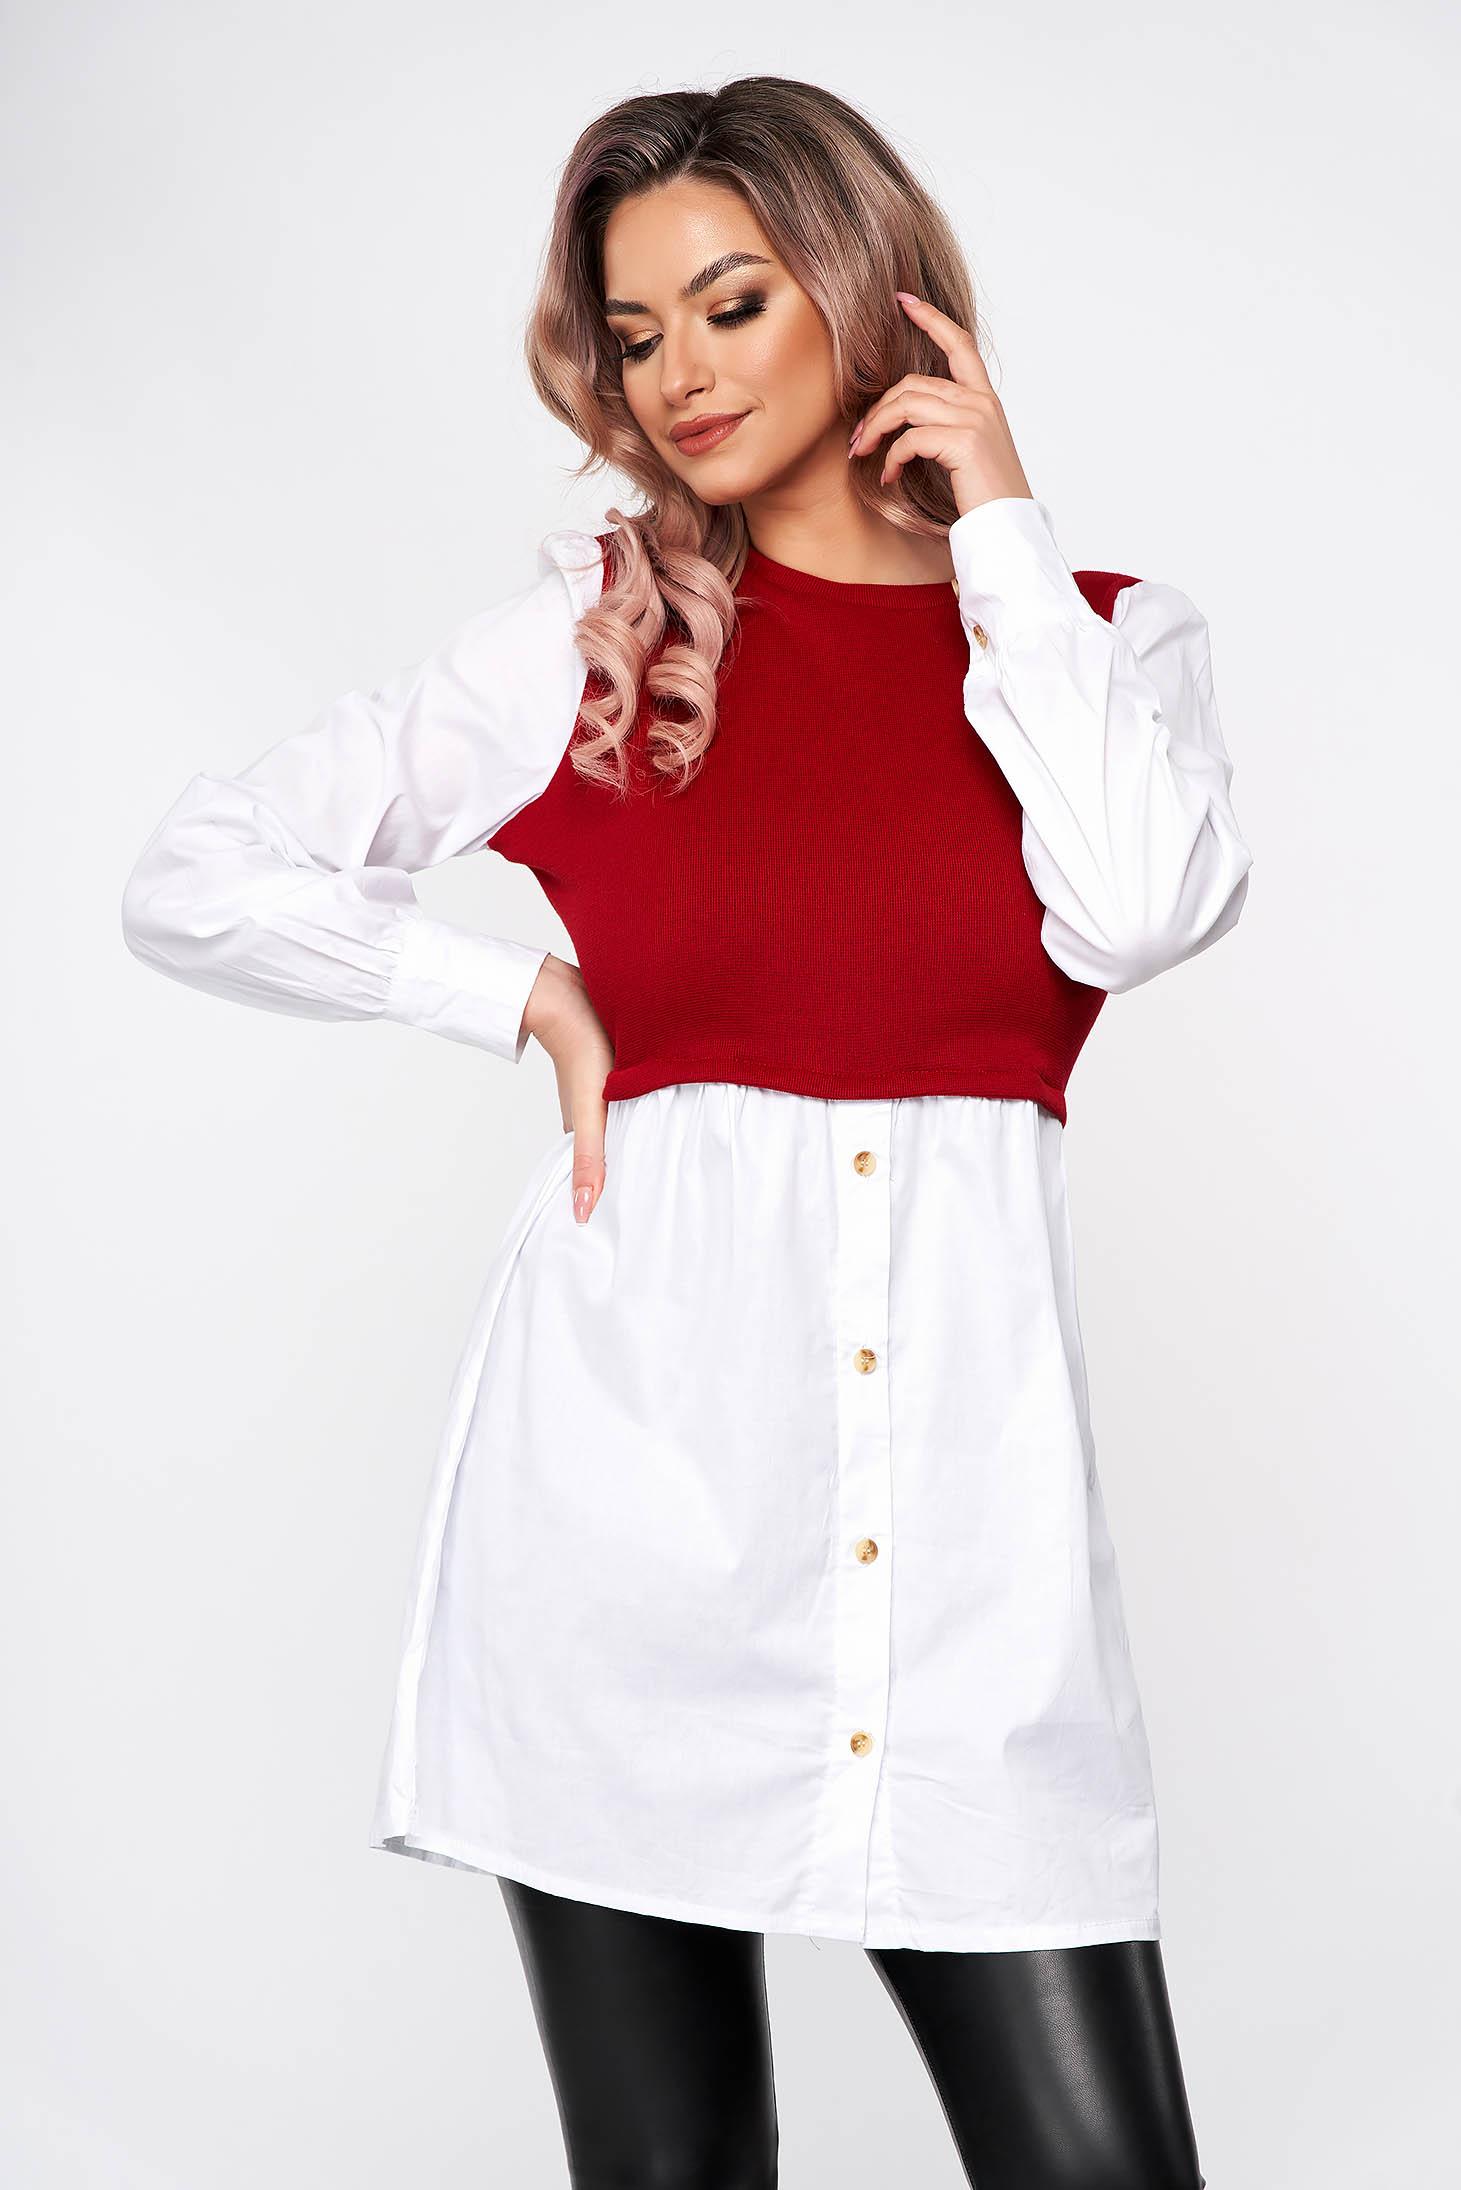 Burgundy dress shirt dress poplin, thin cotton knitted flared